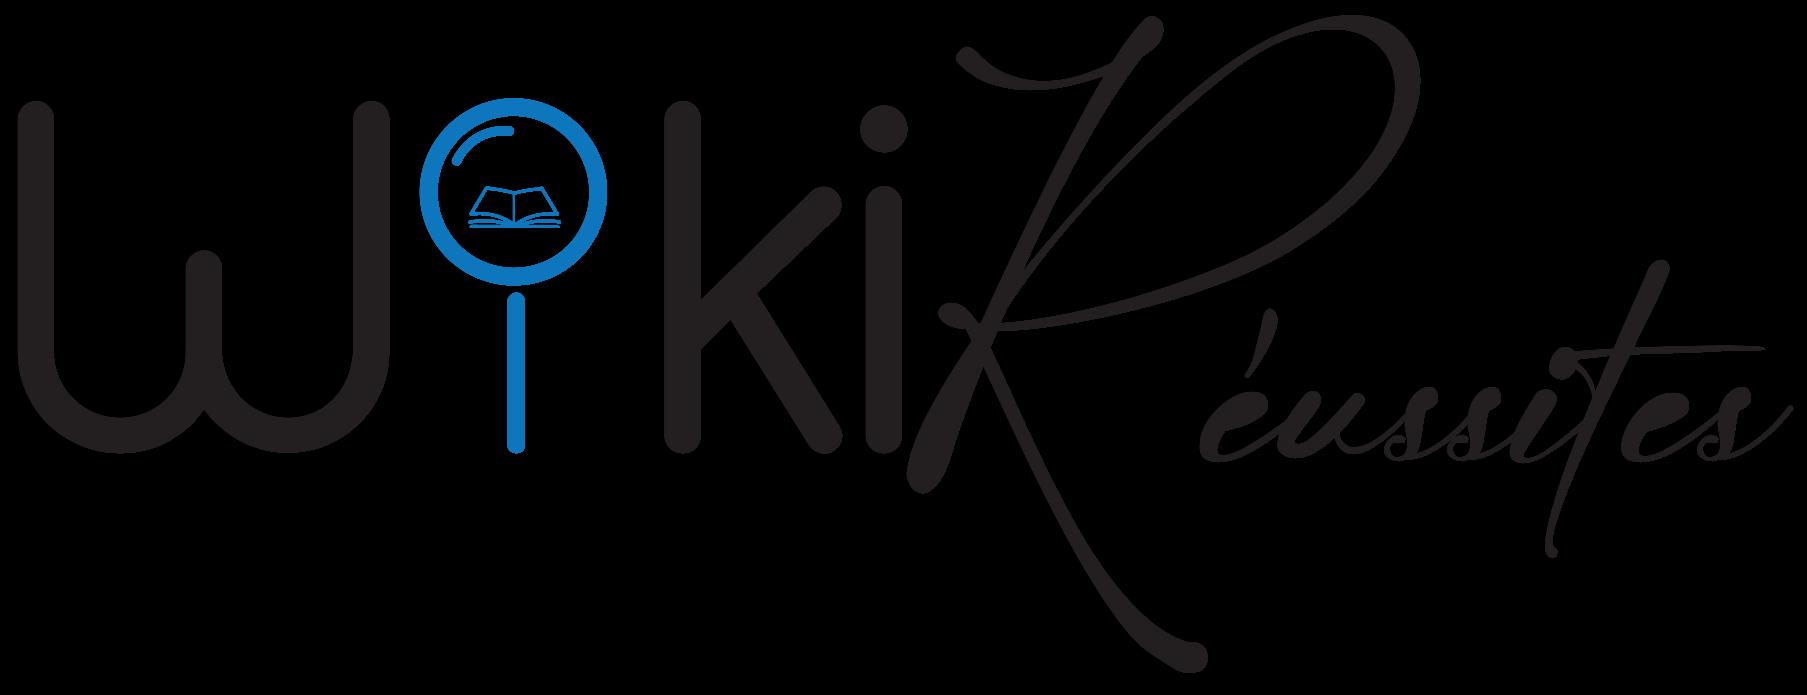 WikiReussites